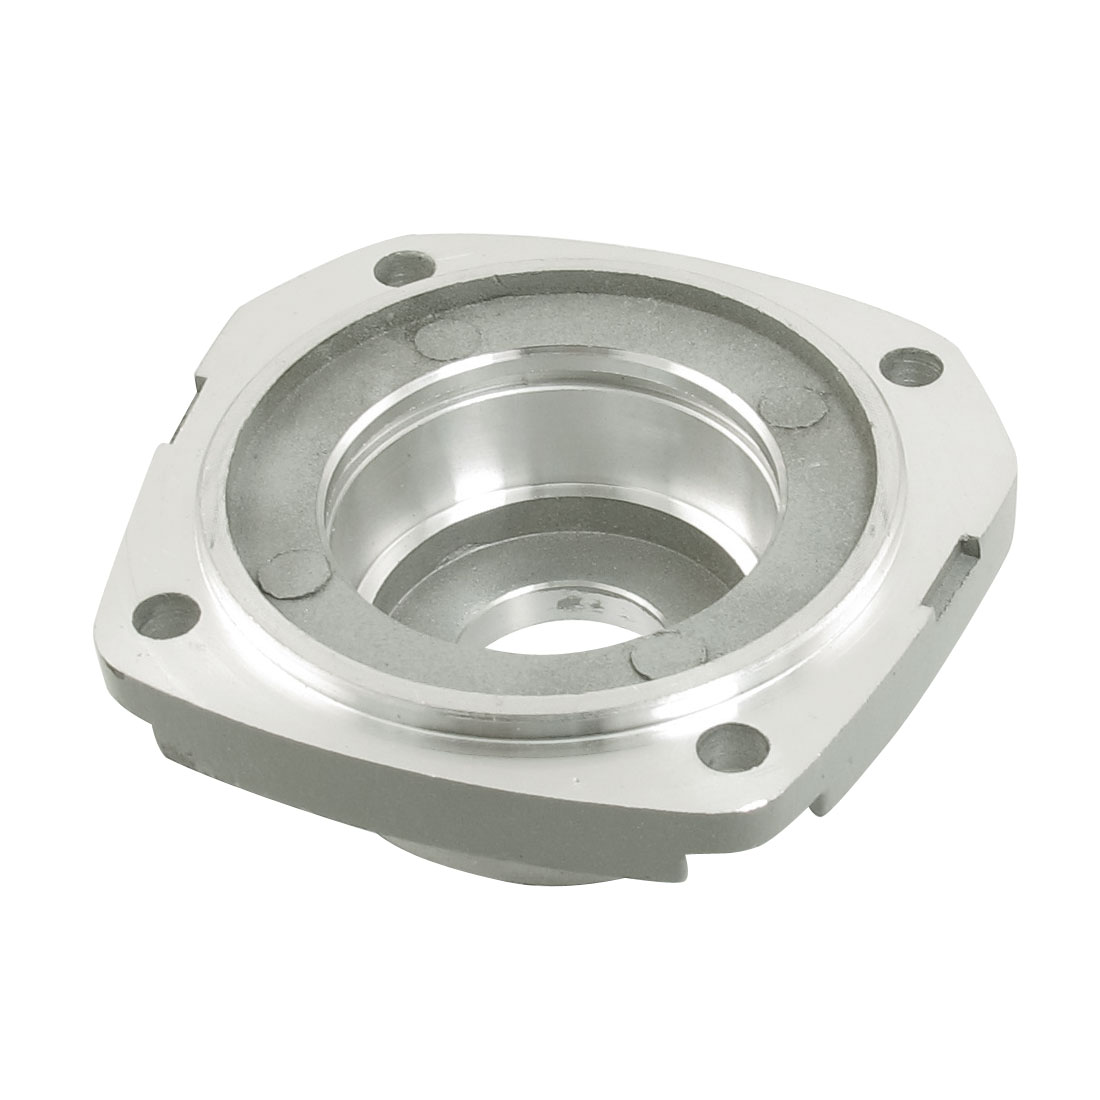 "Replacing 6mm Mount Angle Grinder Aluminum Bearing Seat 2.9"" Length"